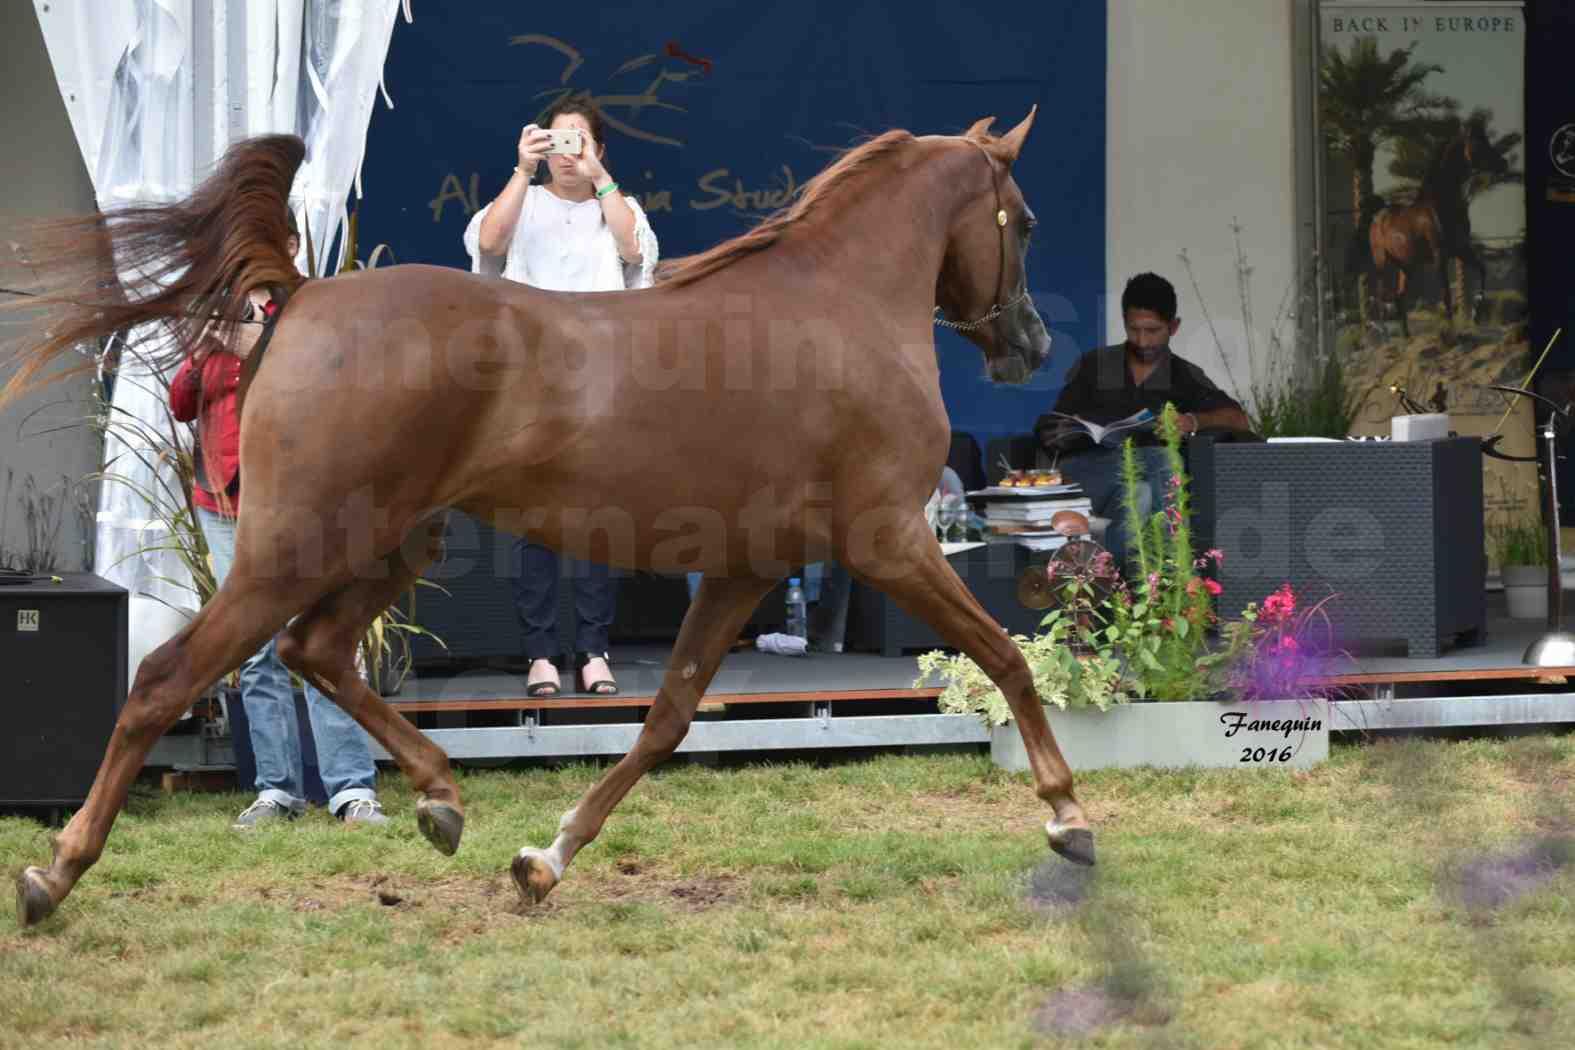 International Arabian Horse Show B de VICHY 2016 - PEARL DE DJOON - Notre Sélection - 39